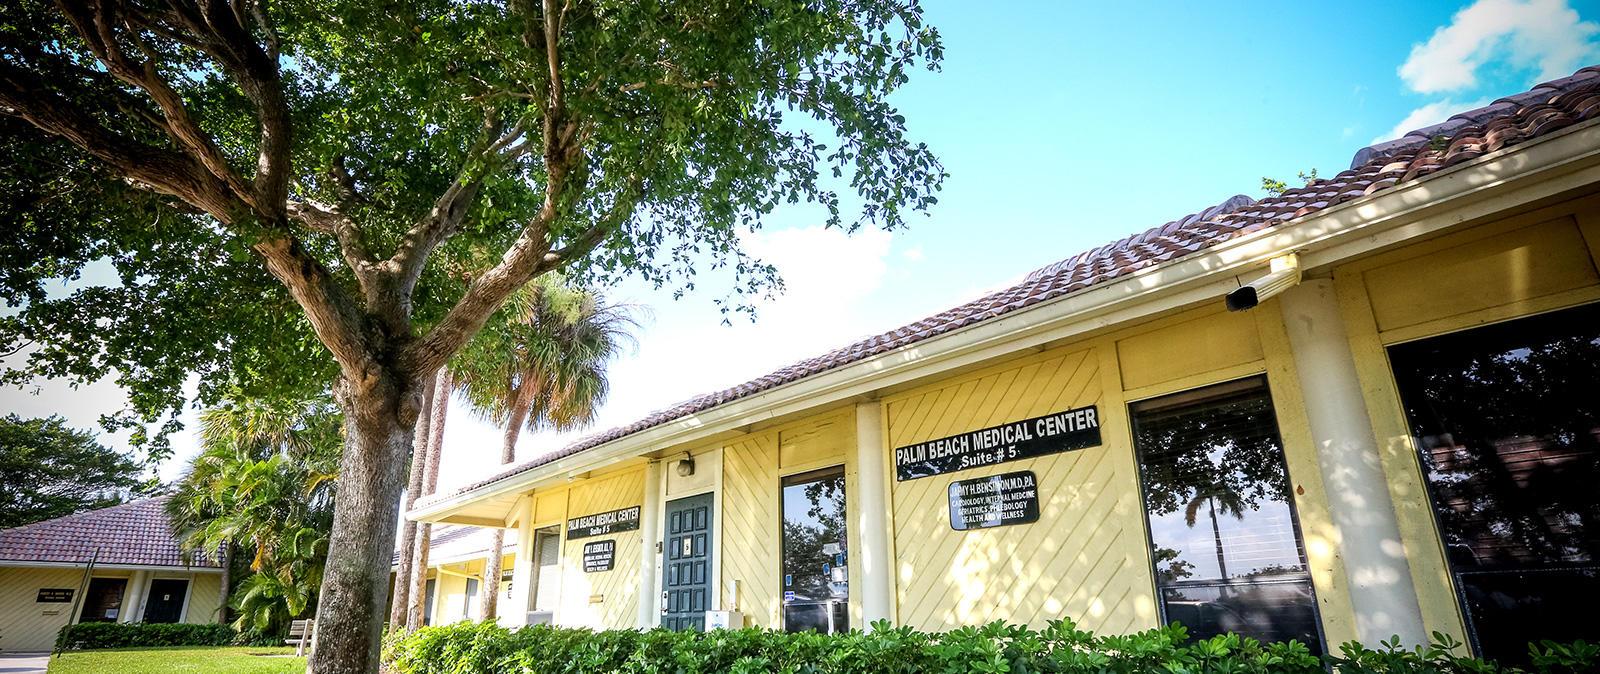 Dr. Jaimy H Bensimon, MD - Palm Beach Medical Center image 1